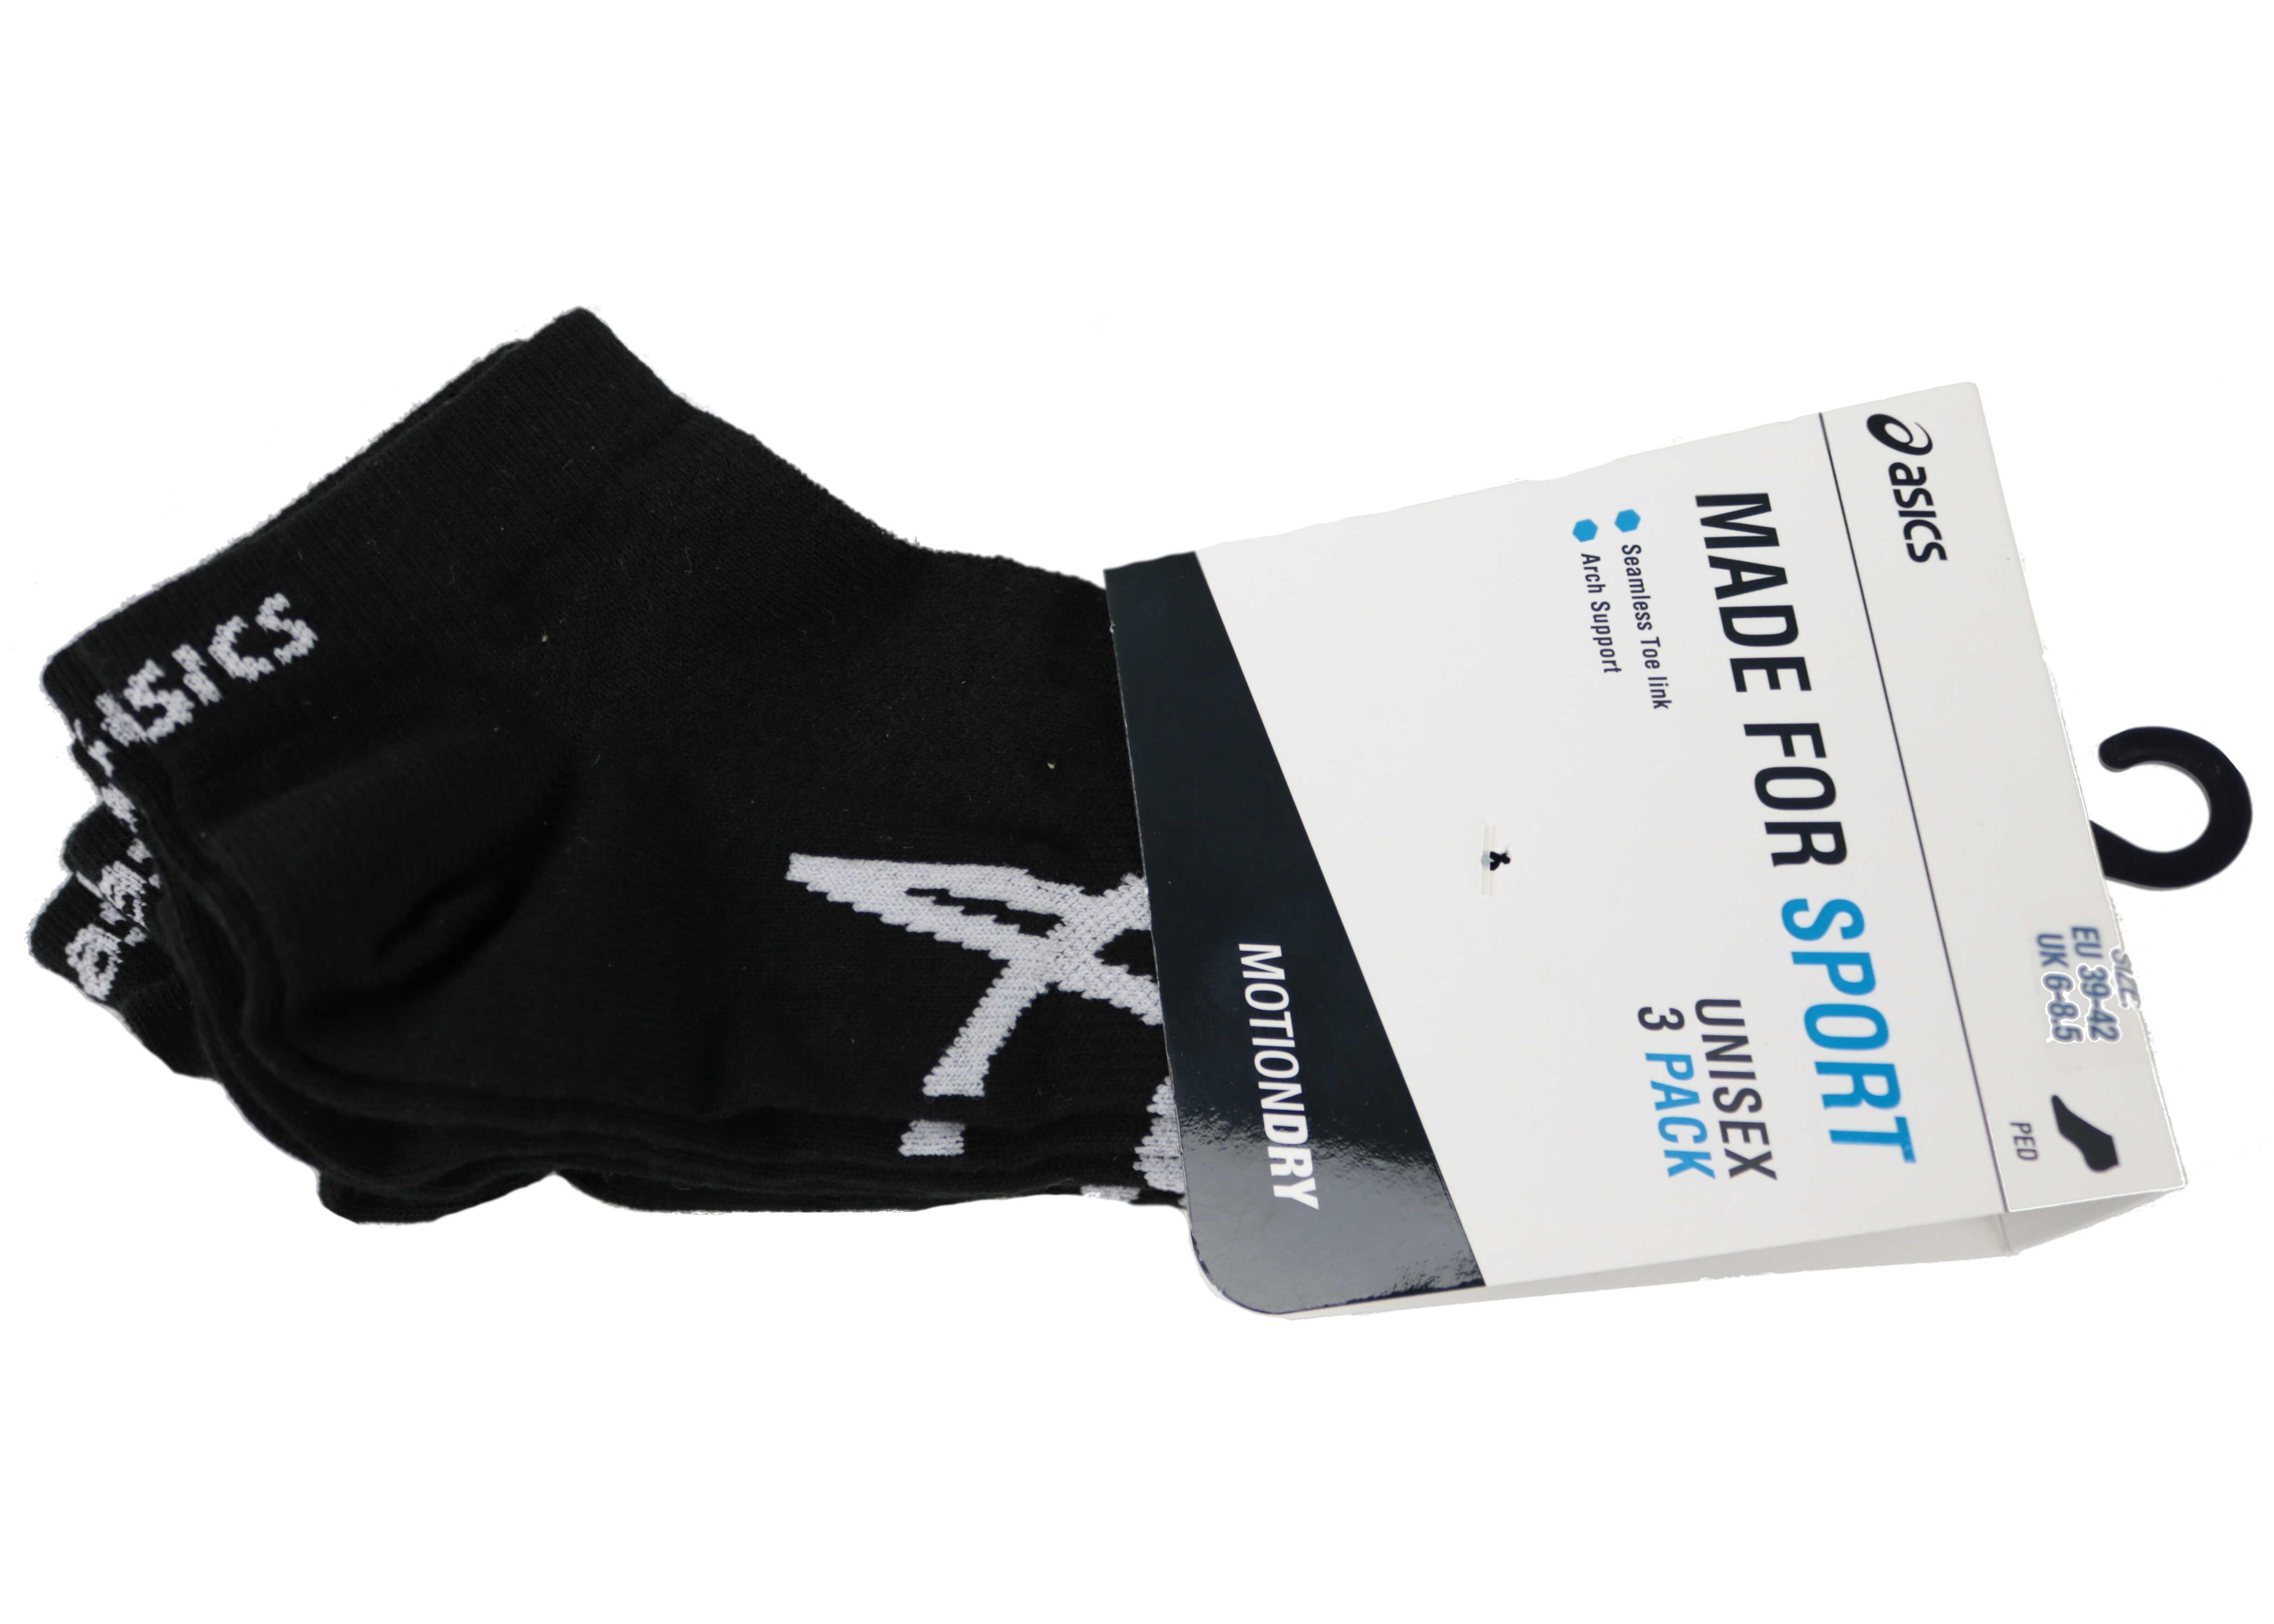 ASICS 3PPK Ped Sock Black